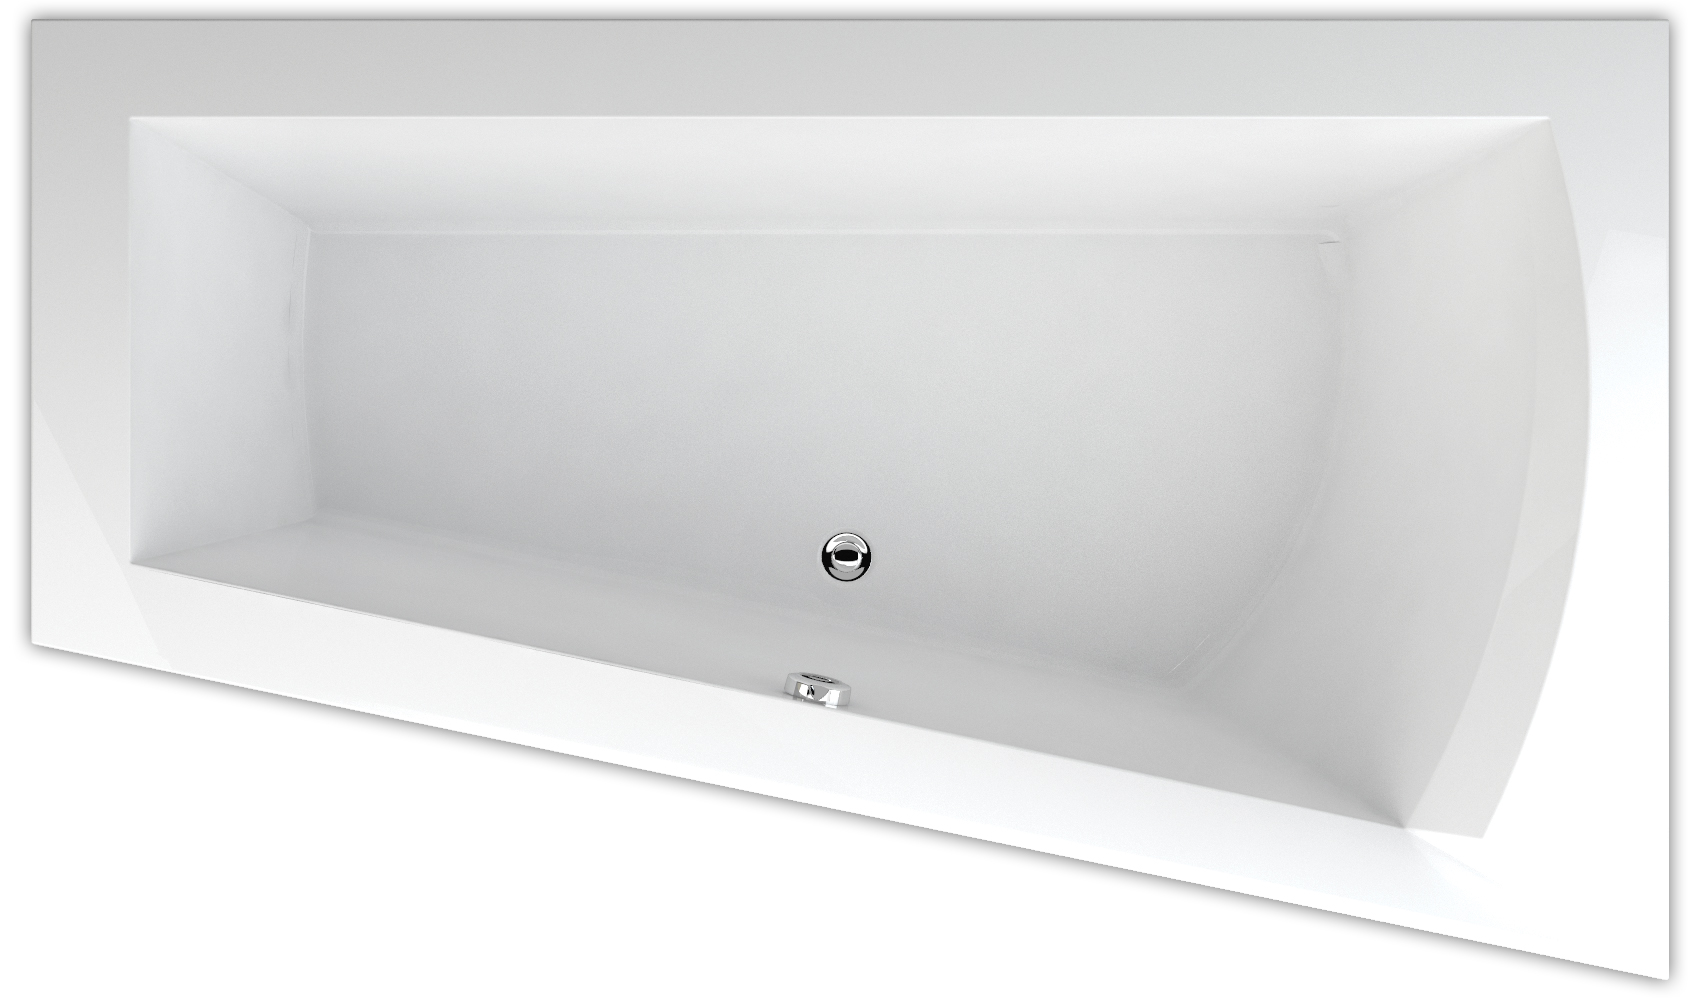 raumspar badewanne nera 170 x 100 65 5 x 50 cm form rechts sonderpreis ebay. Black Bedroom Furniture Sets. Home Design Ideas